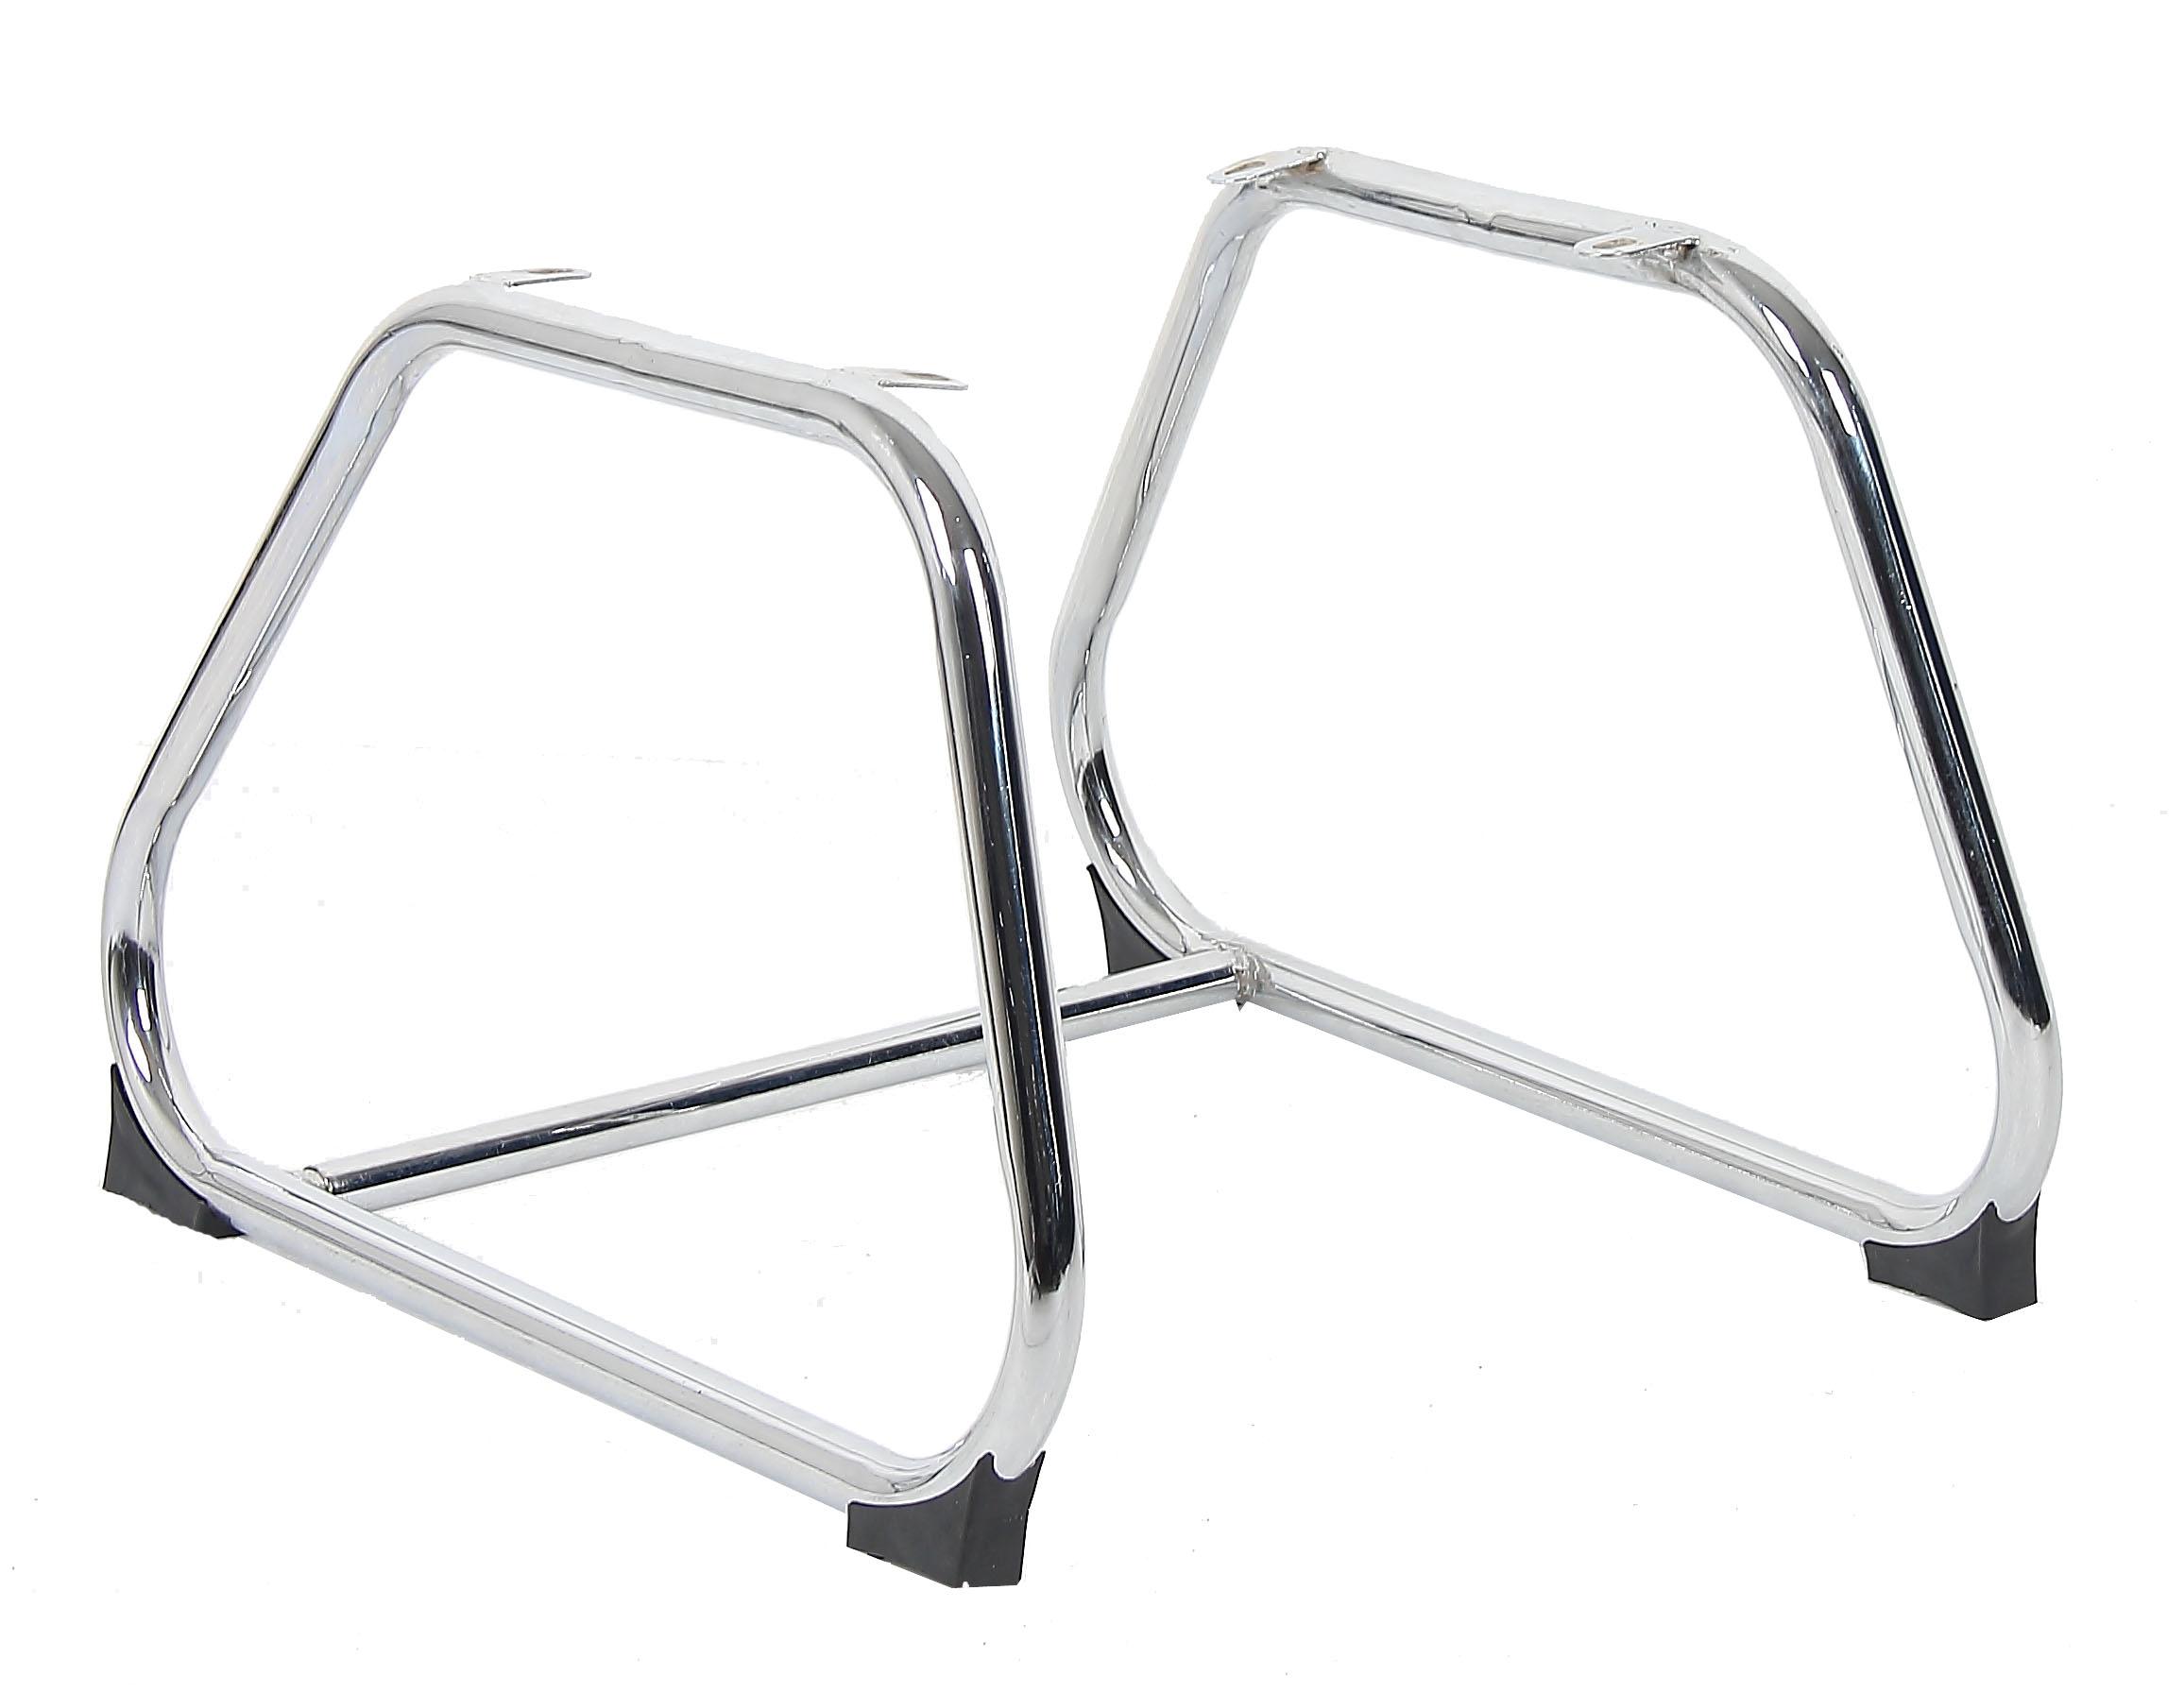 norstar office chair parts metal restaurant chairs canada  bosschair